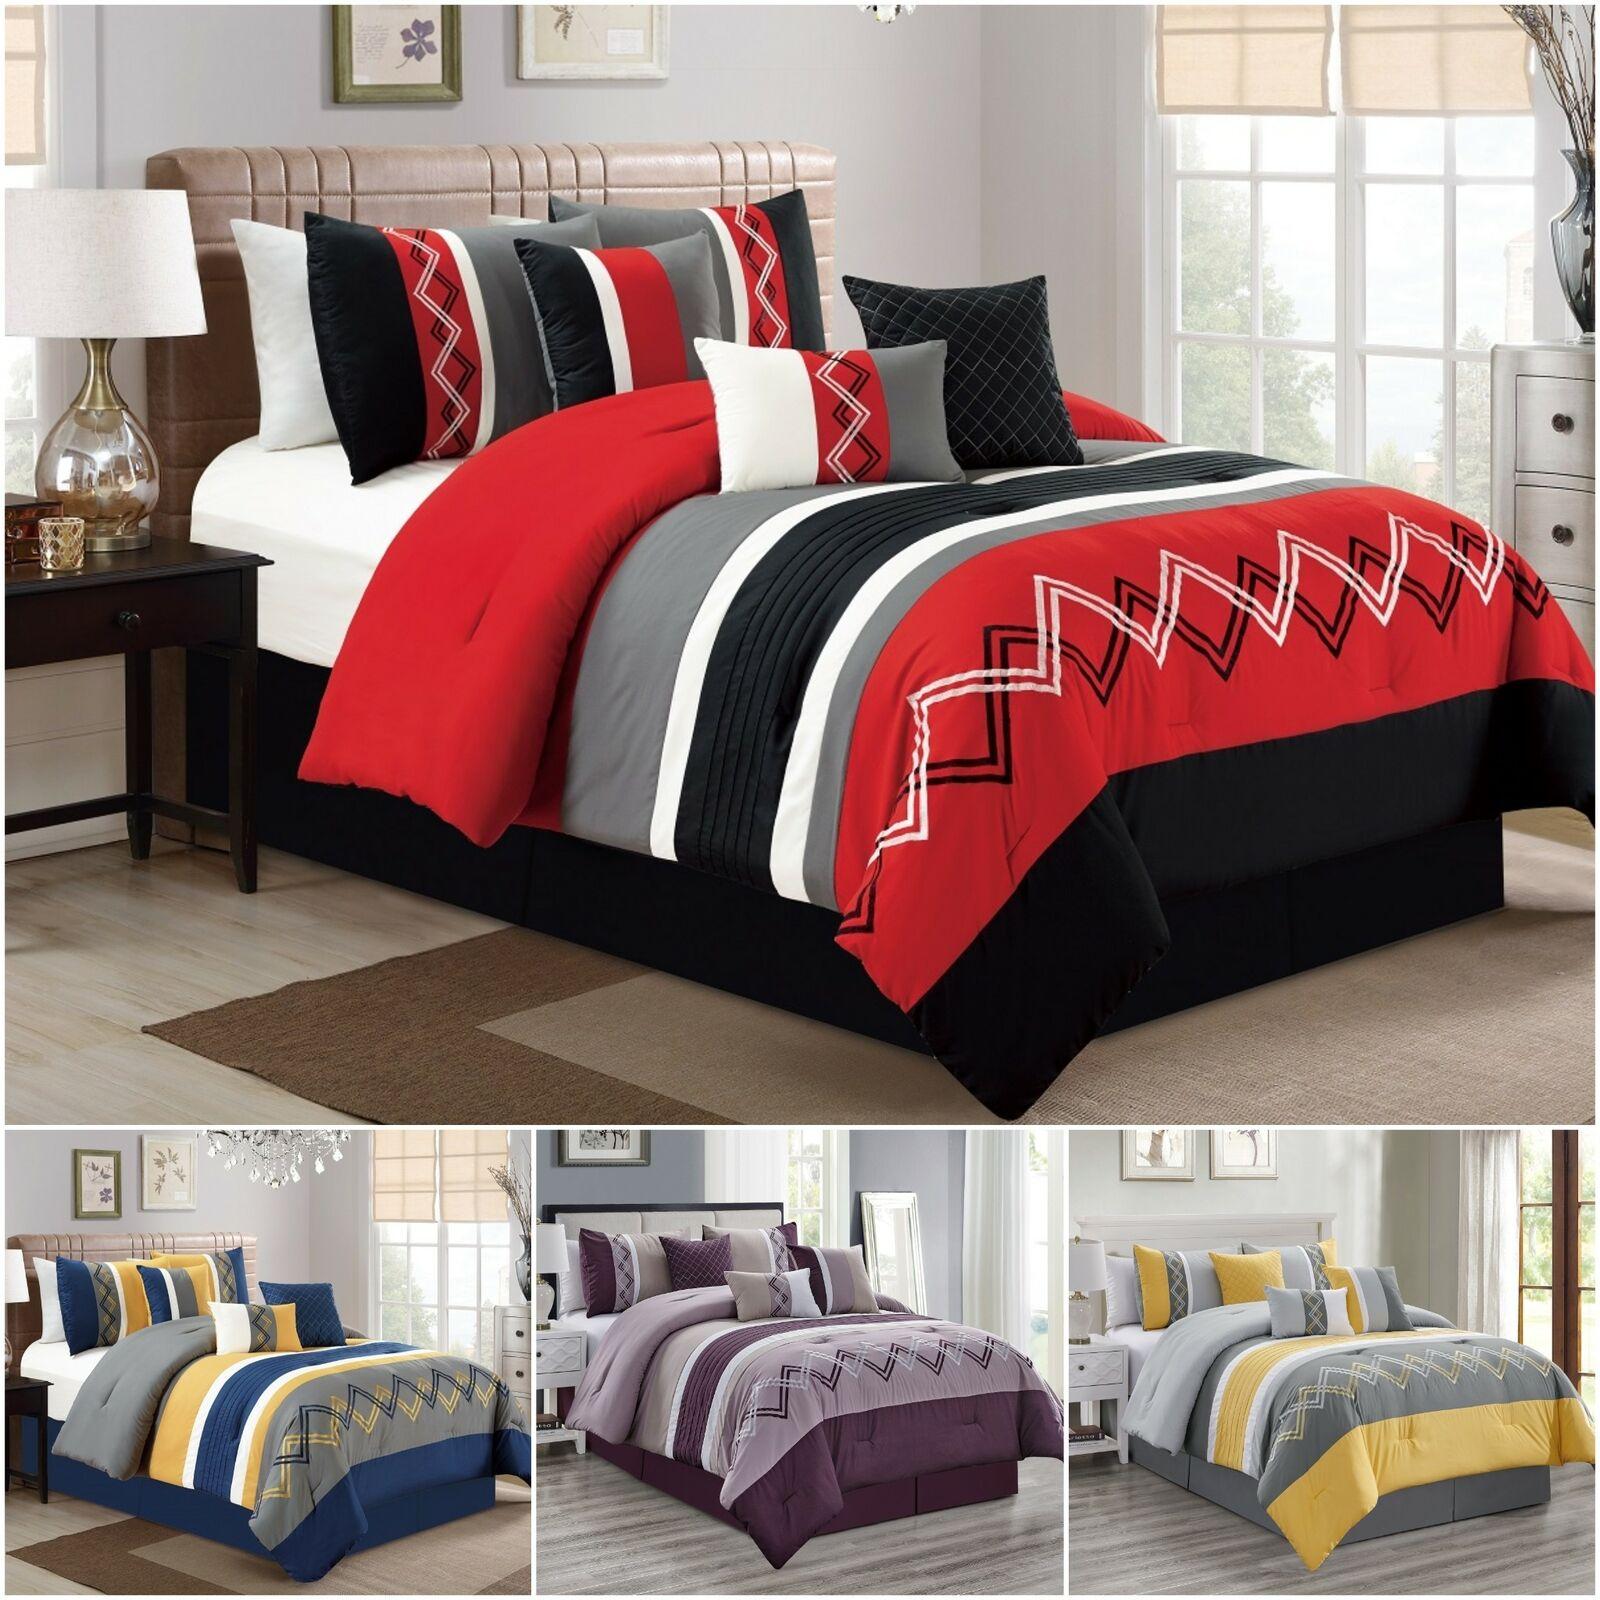 Black Red Full Rugby Stripes Comforter Set Gray White Striped Pattern Bedding For Sale Online Ebay